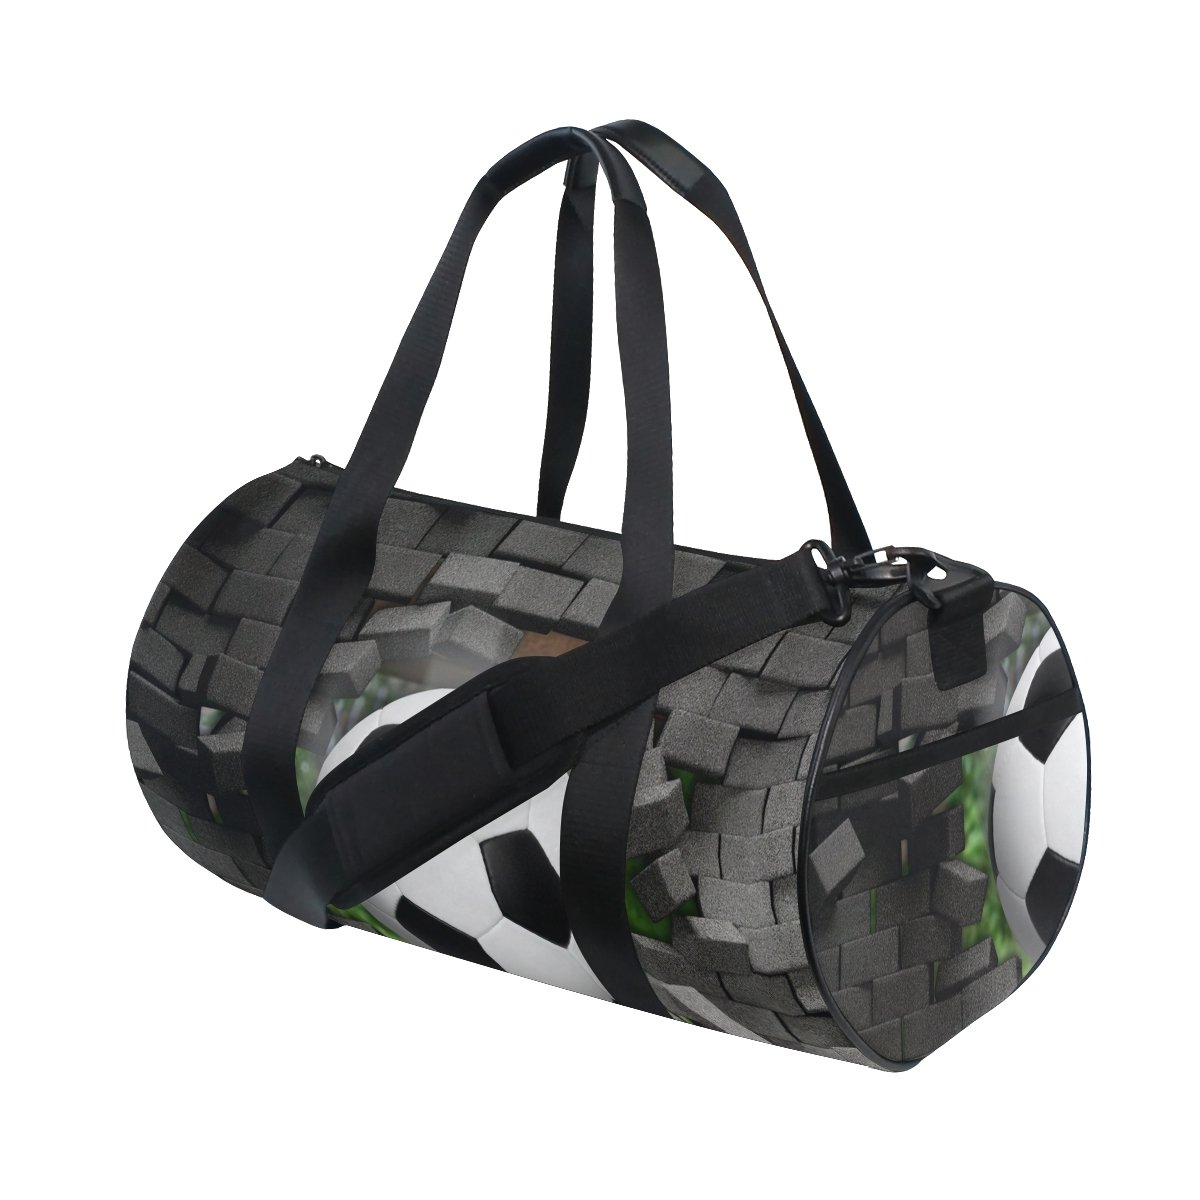 Naanle Soccer Broken Brick Wall Pattern Ameican Football Gym bag Sports Travel Duffle Bags for Men Women Boys Girls Kids by Naanle (Image #1)